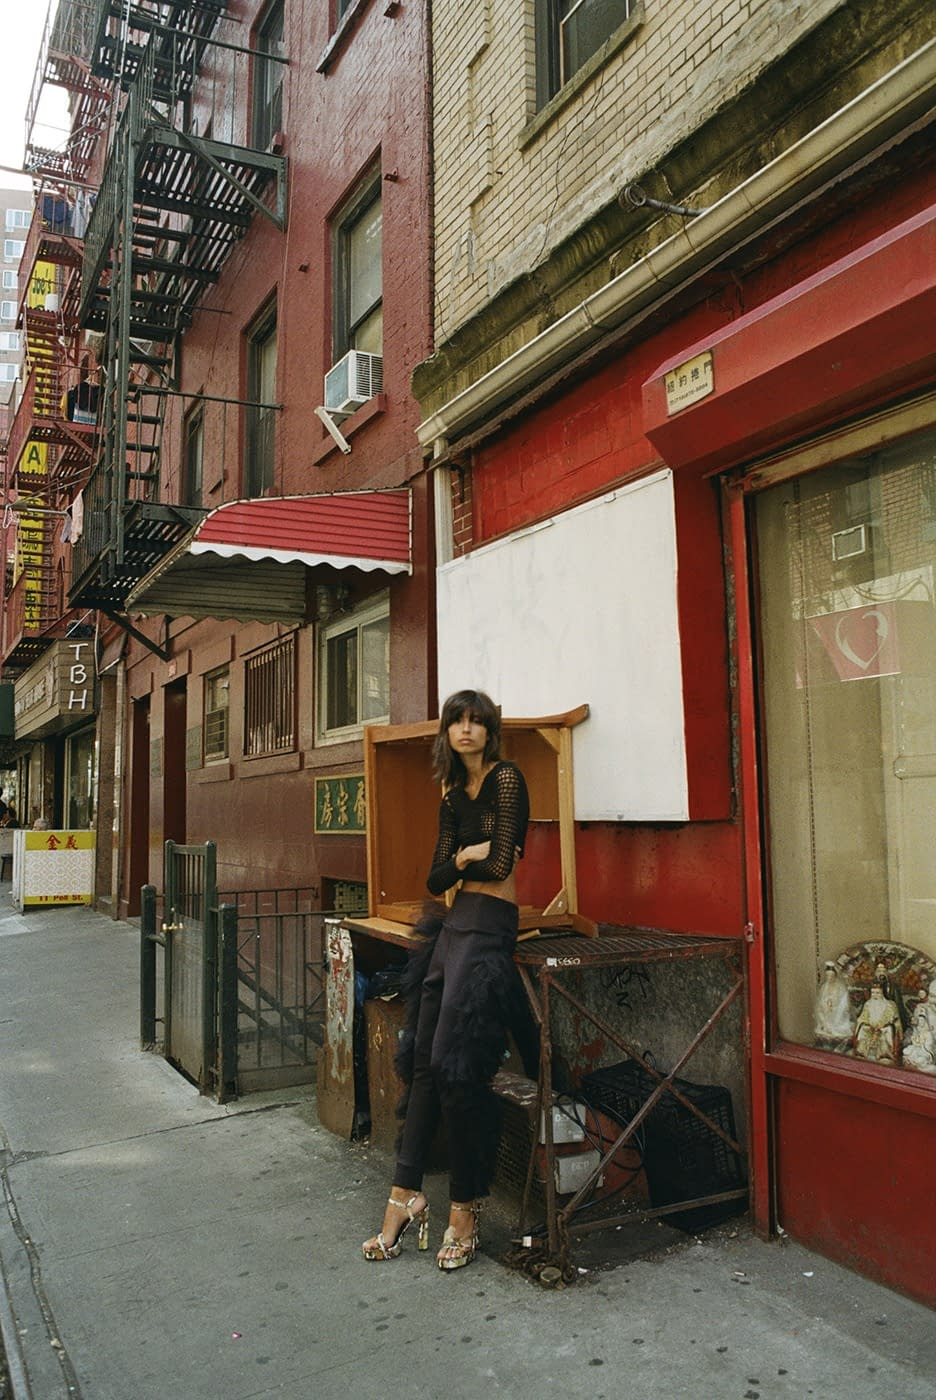 New York Stories 1 photo Enric Galceran - 07